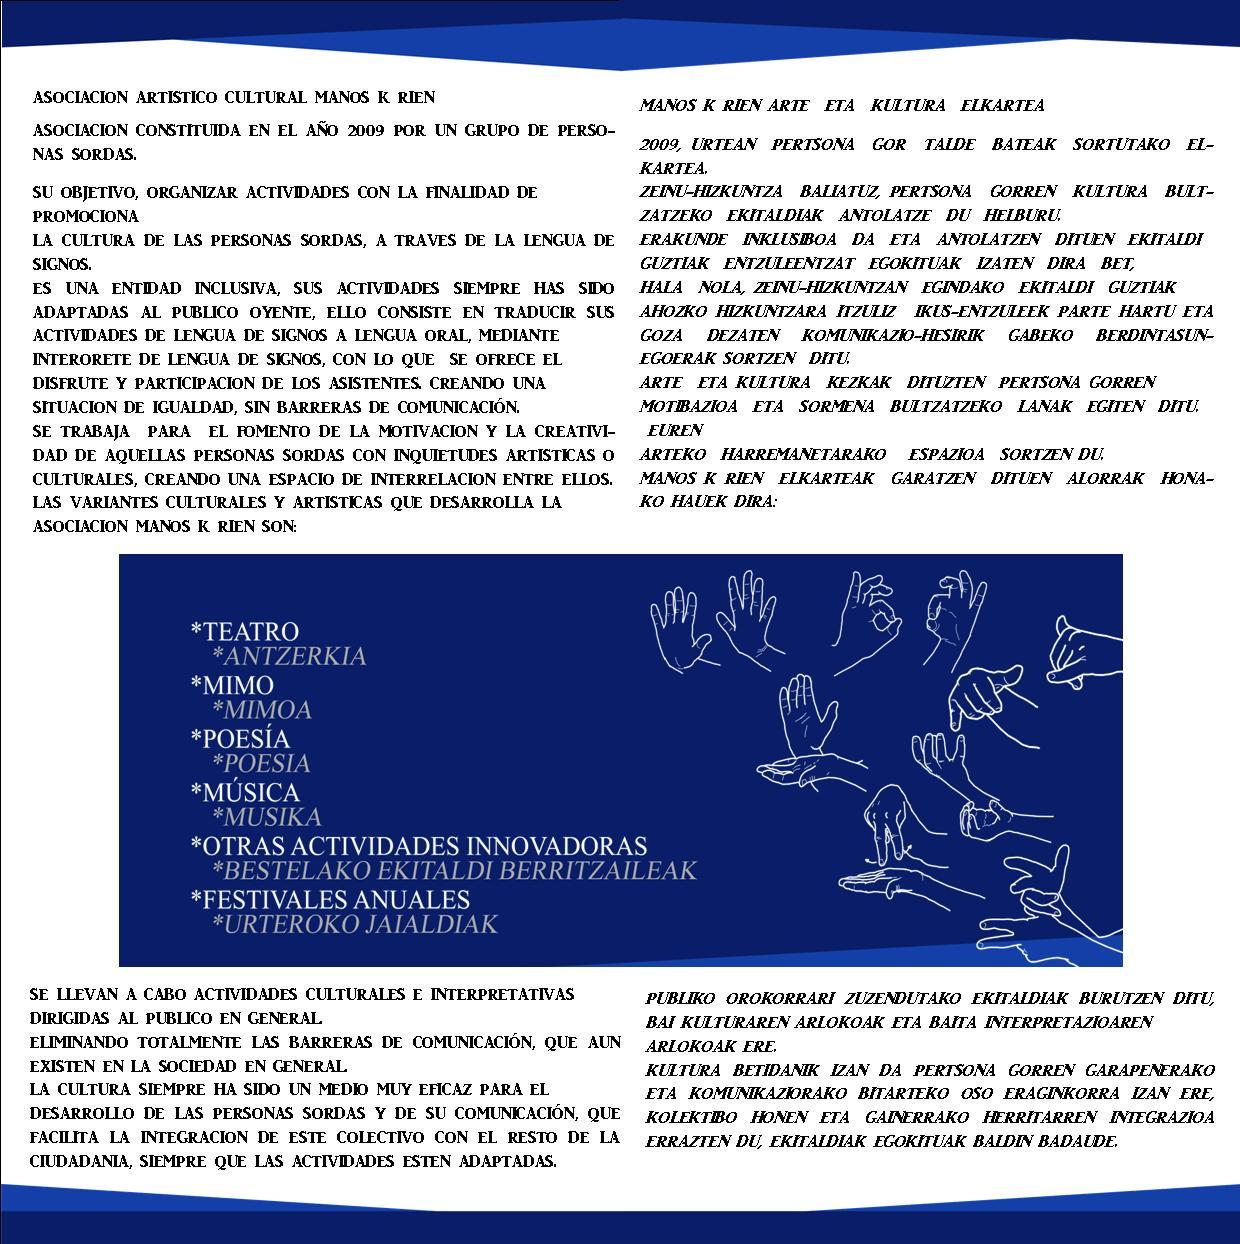 folleto mkr